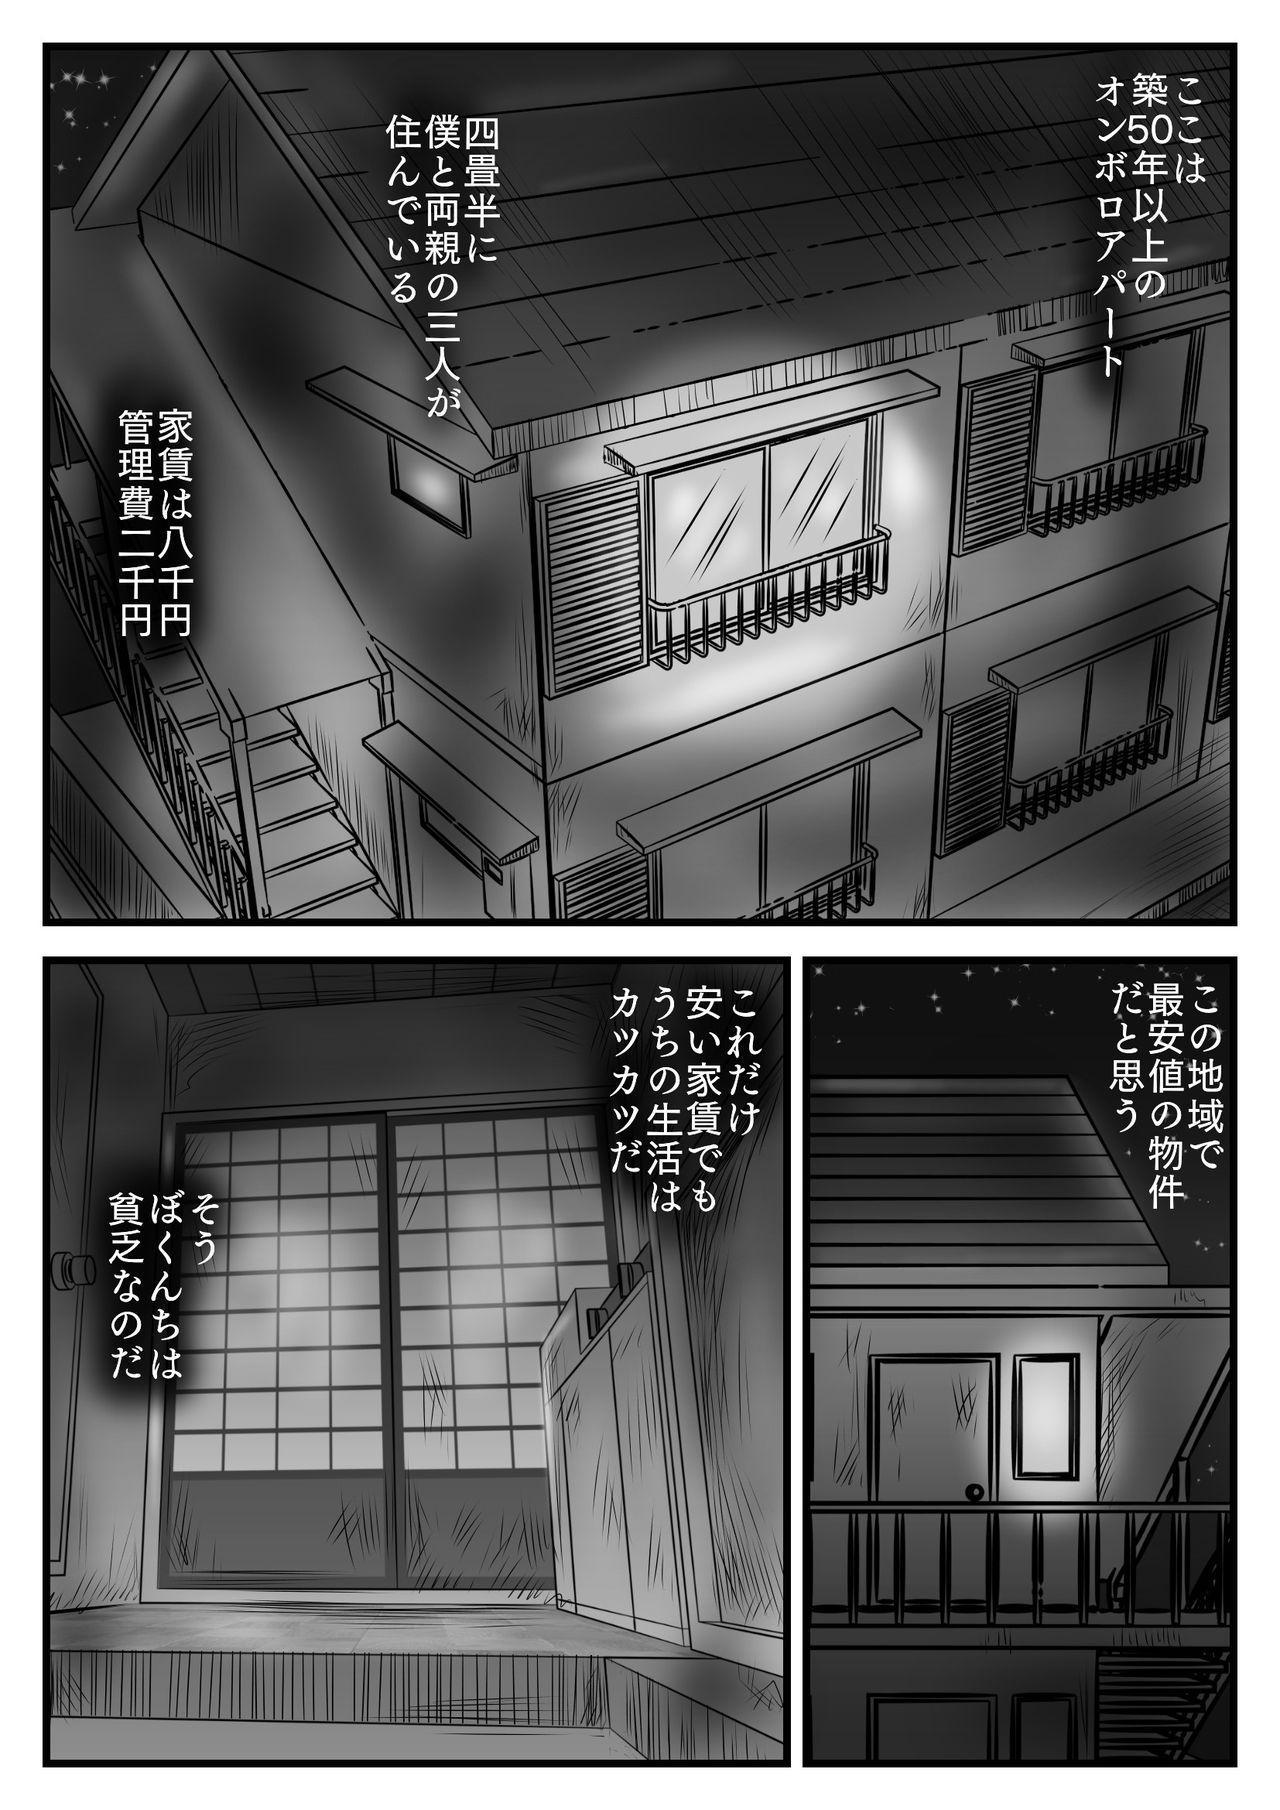 Owabi to Iccha Nanda ga Kaa-chan Daku? 1